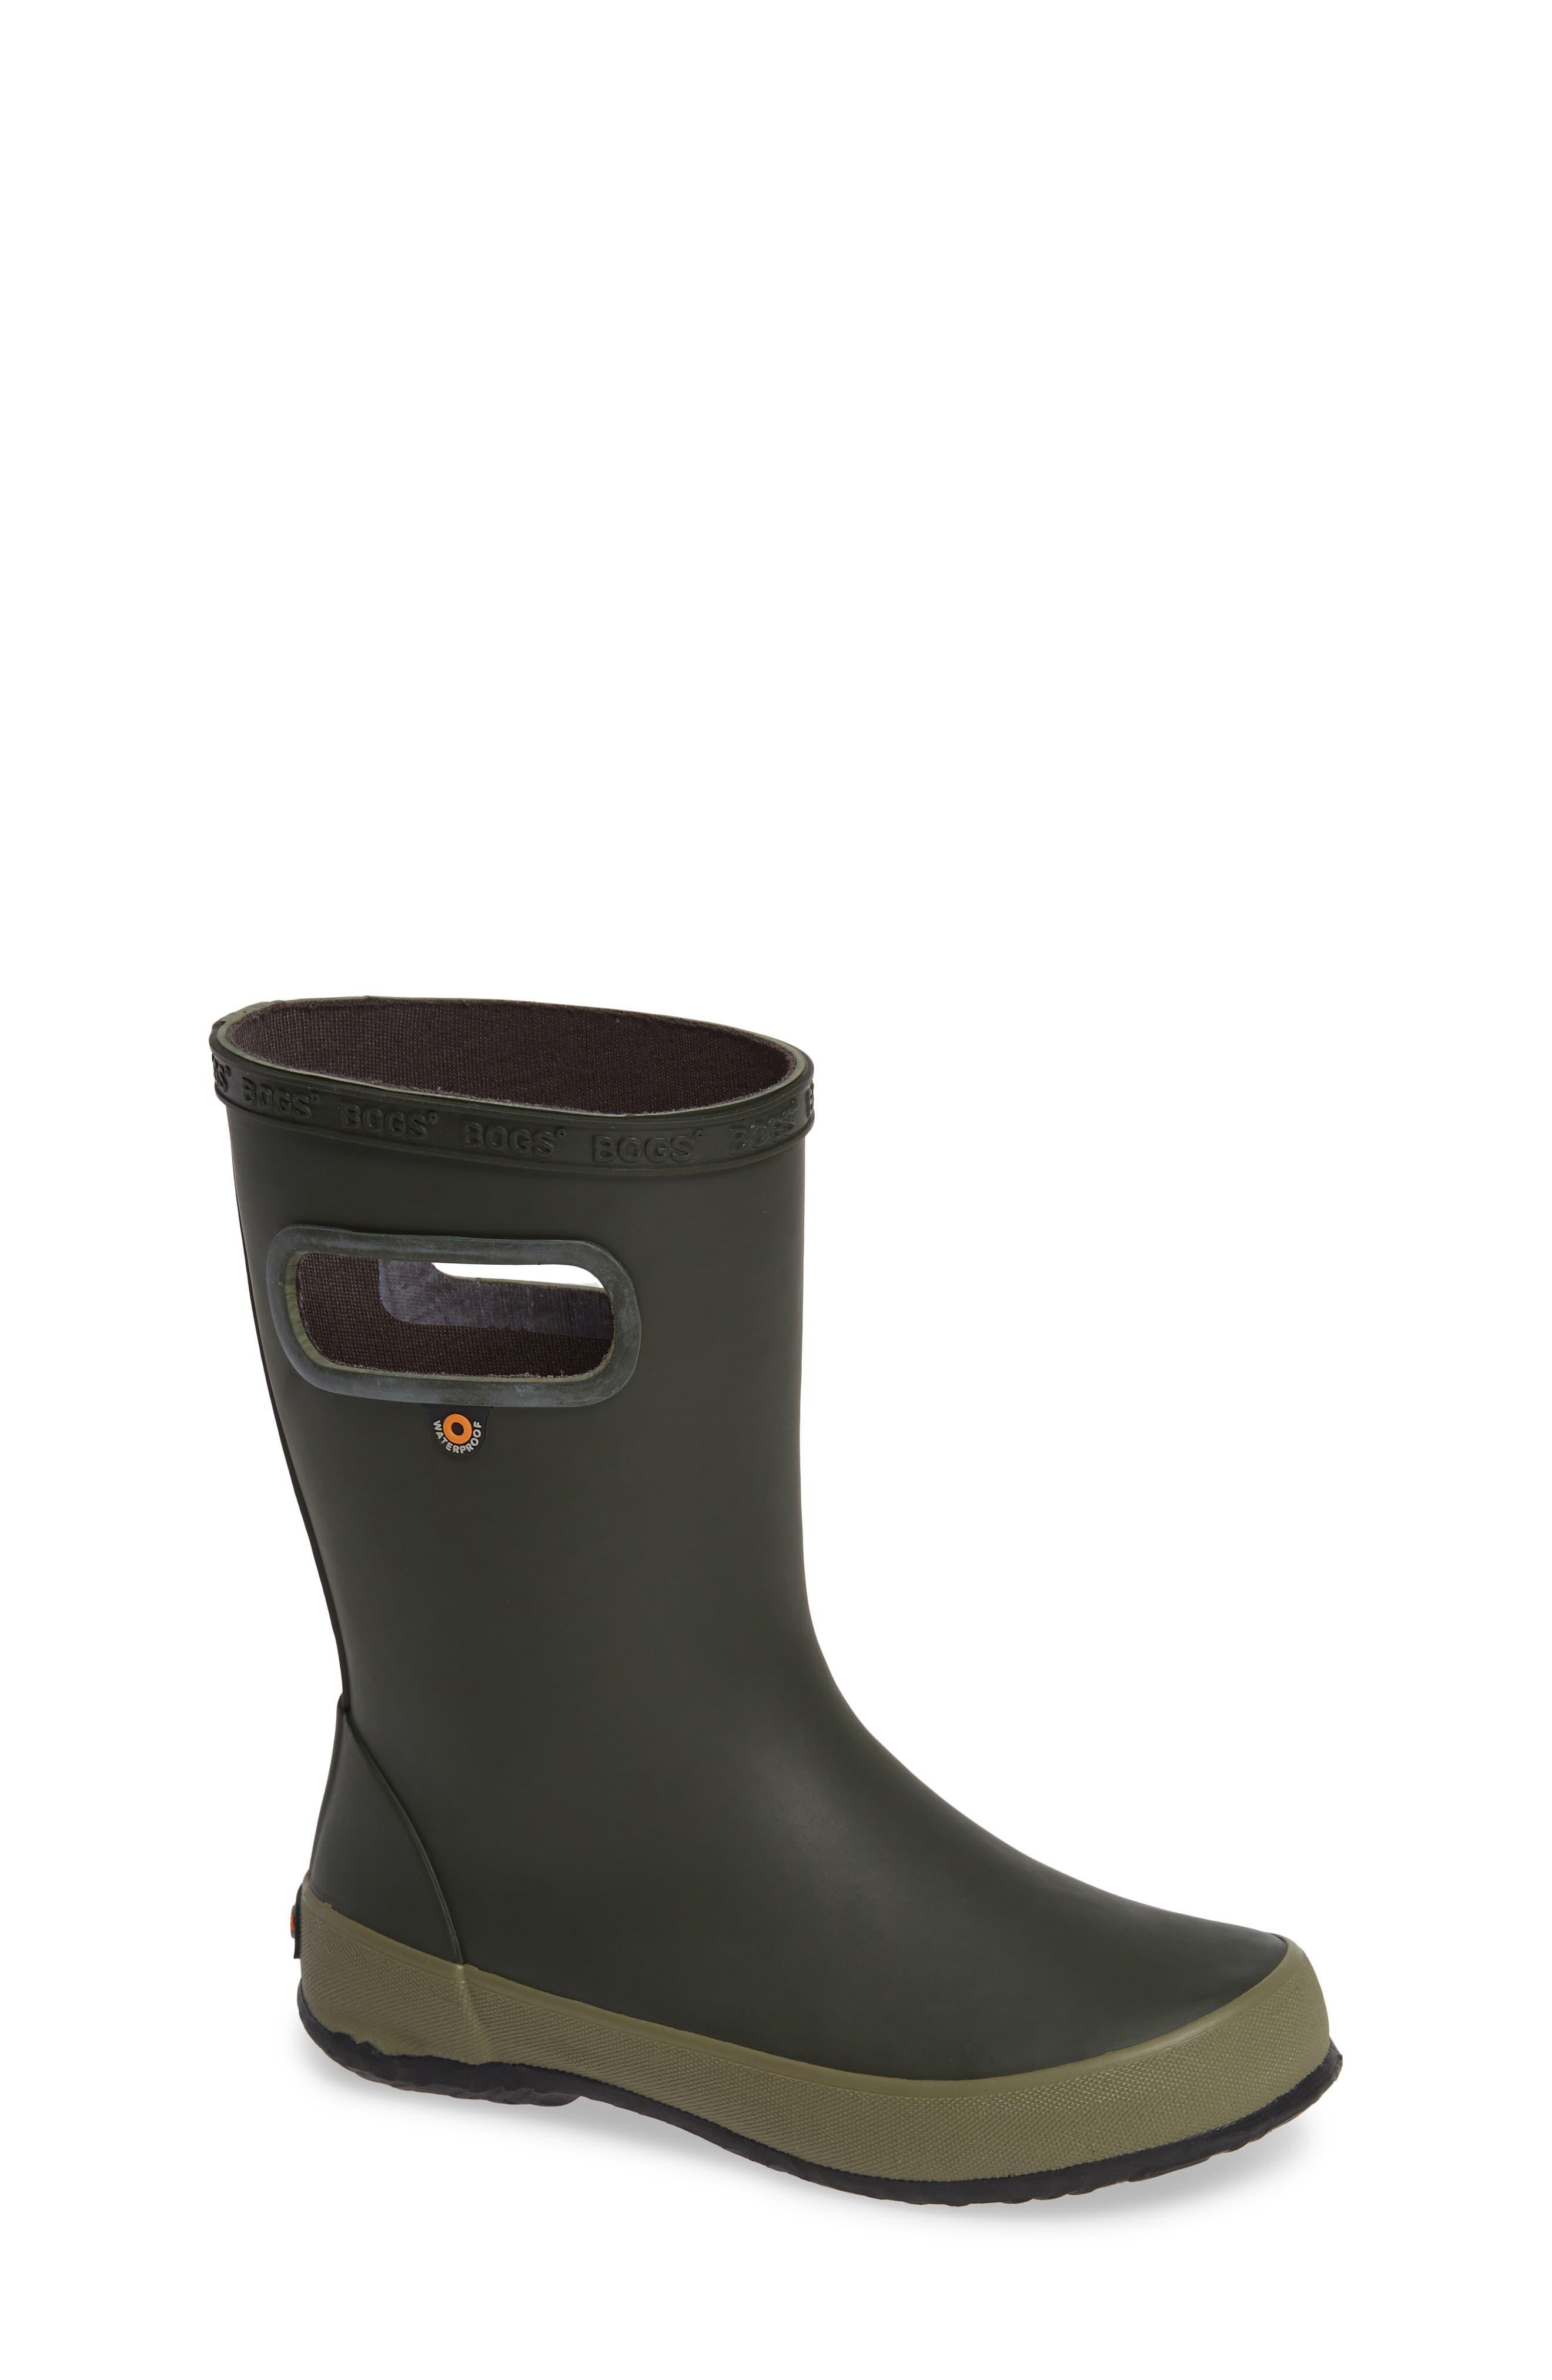 BOGS, Skipper Solid Rubber Rain Boot, Main thumbnail 1, color, DARK GREEN